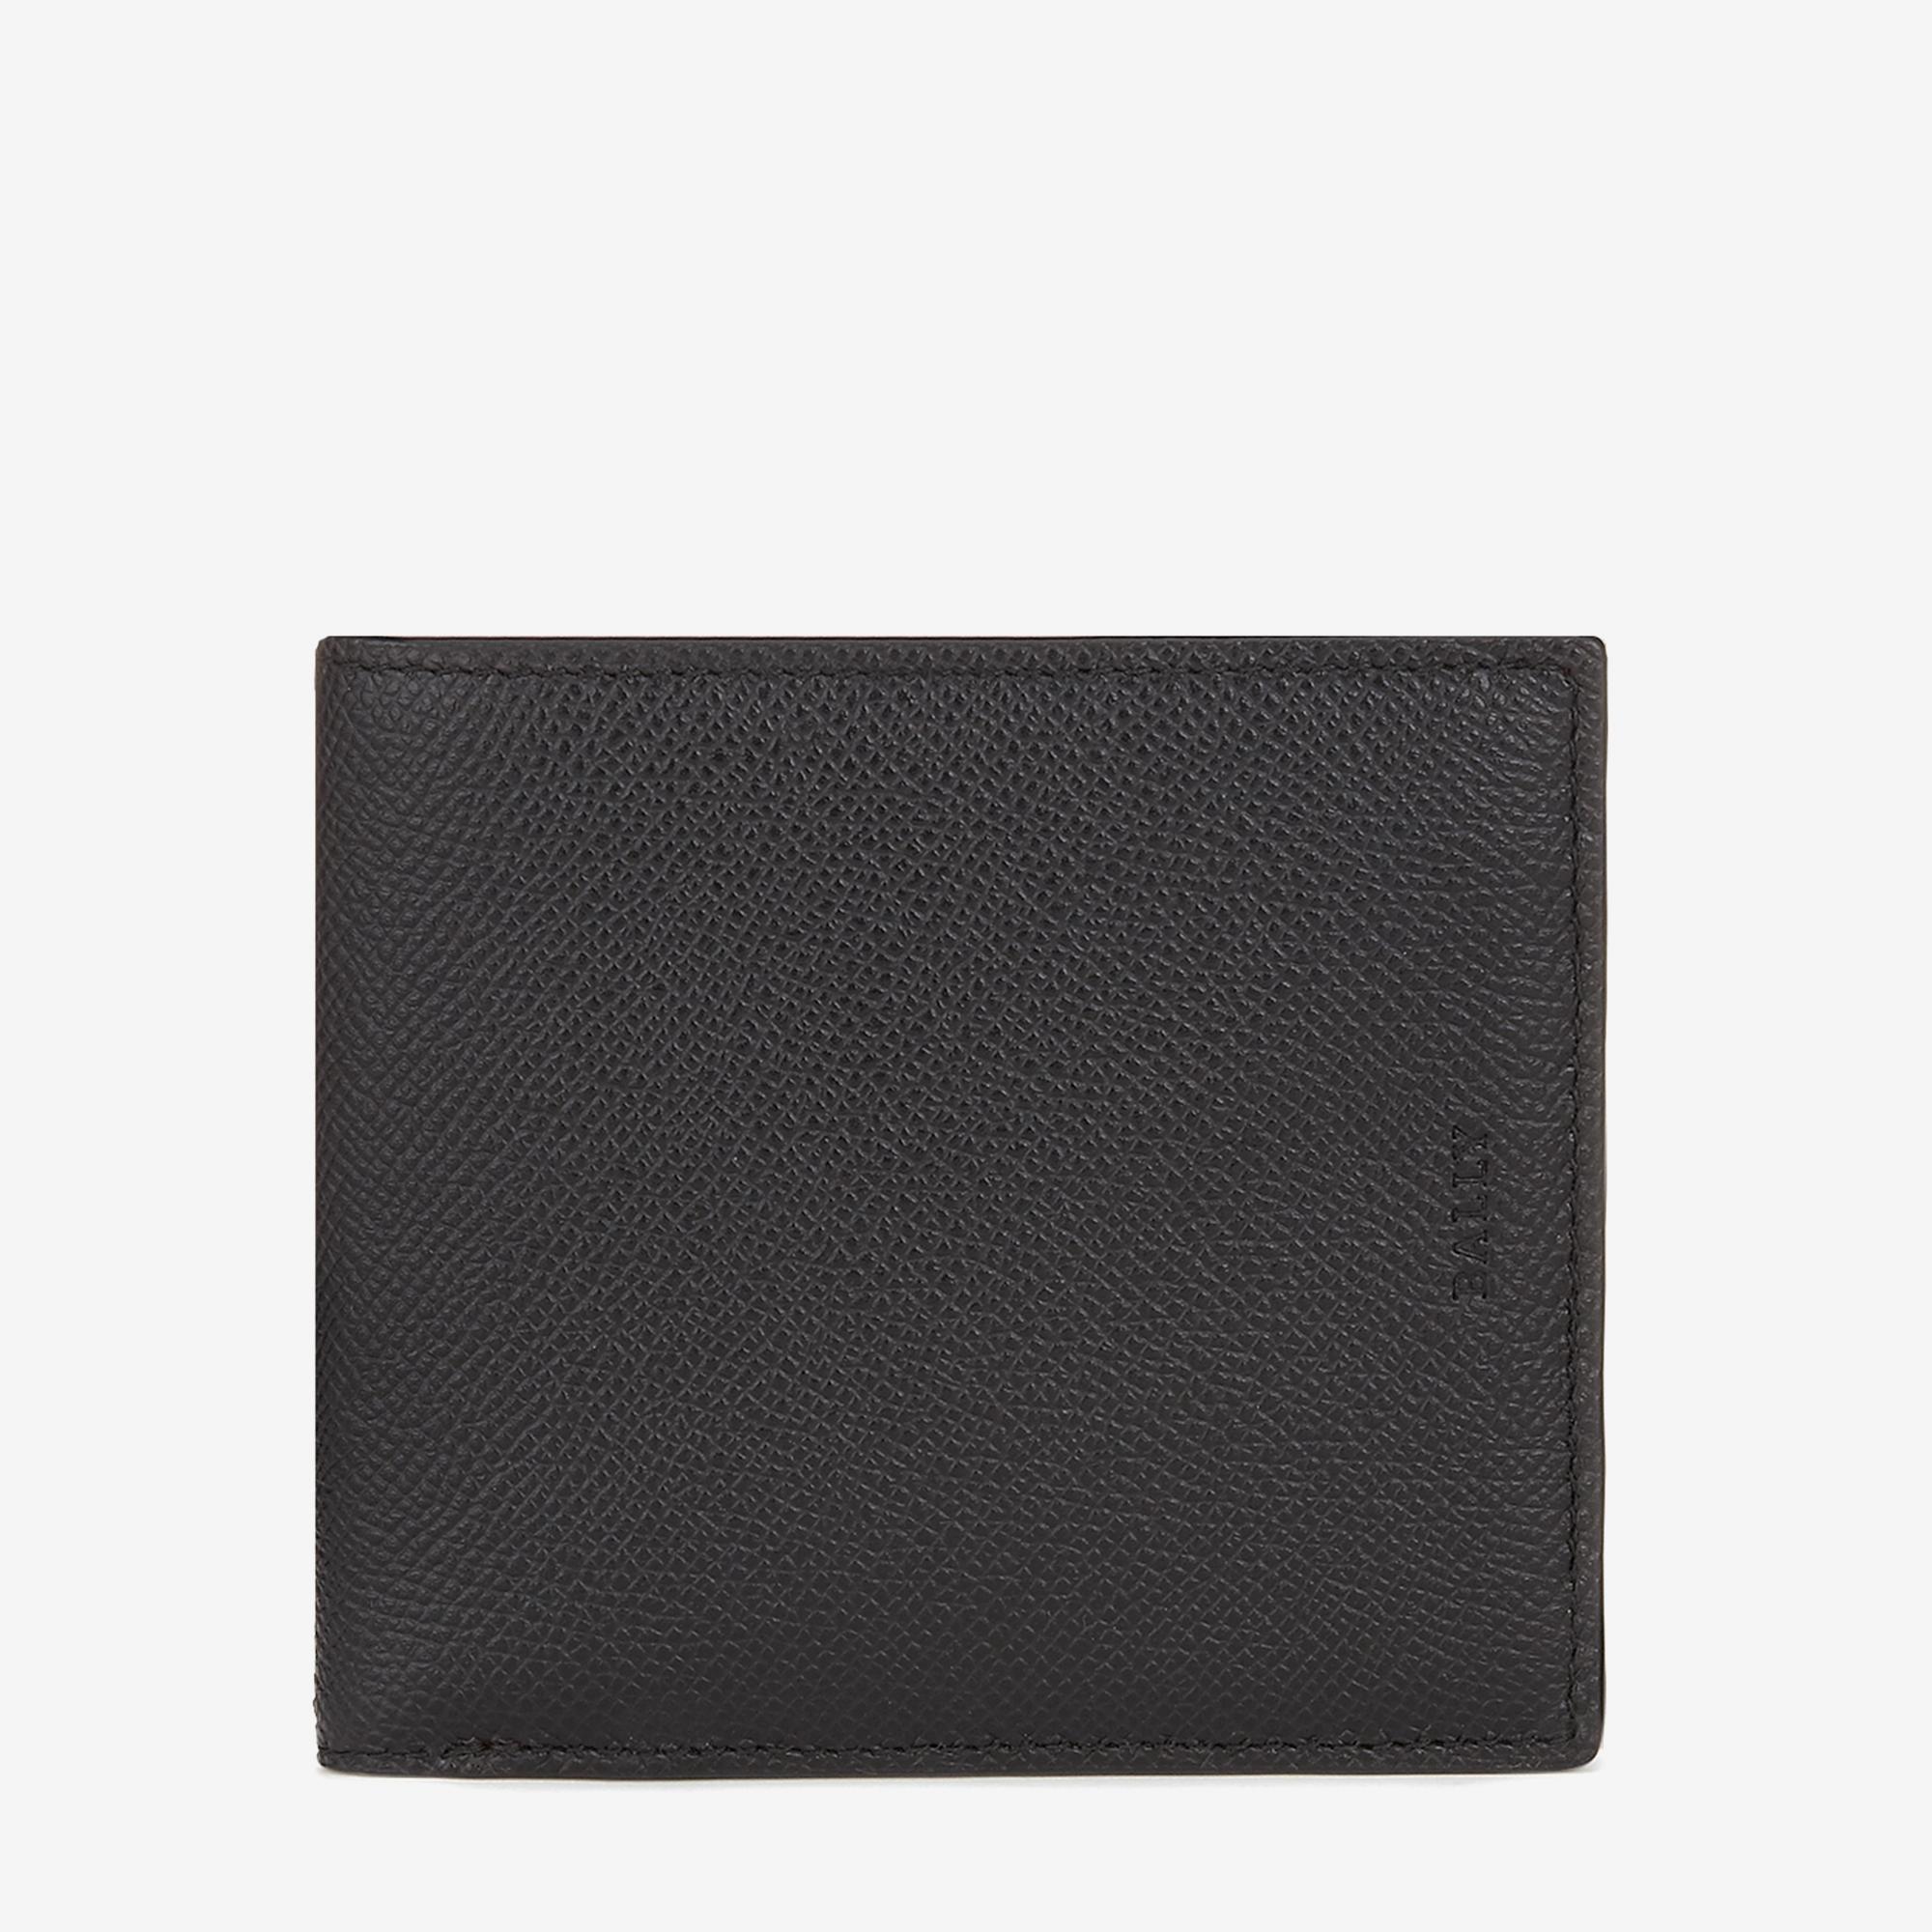 BYIE| Men's Wallet | Bally Accessories